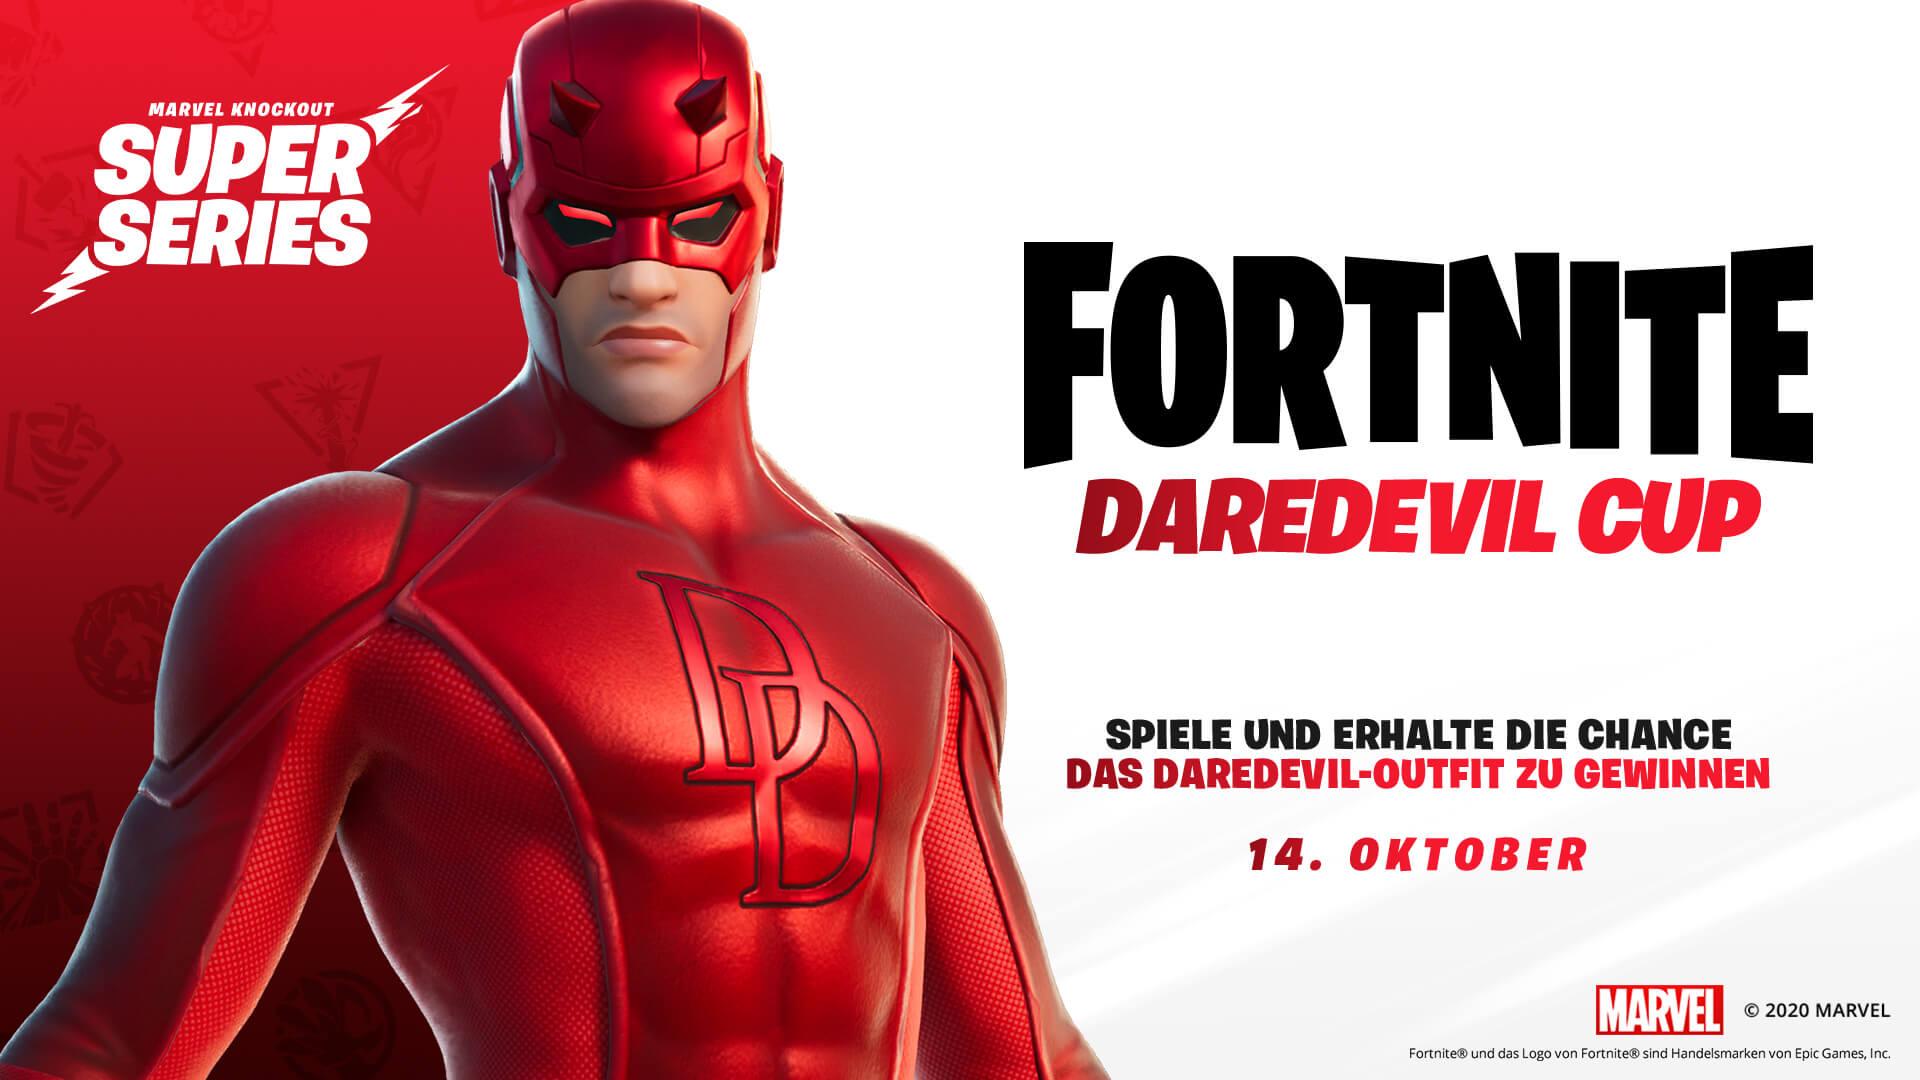 DE 14BR Competitive MarvelSuperSeries DaredevilCup Social